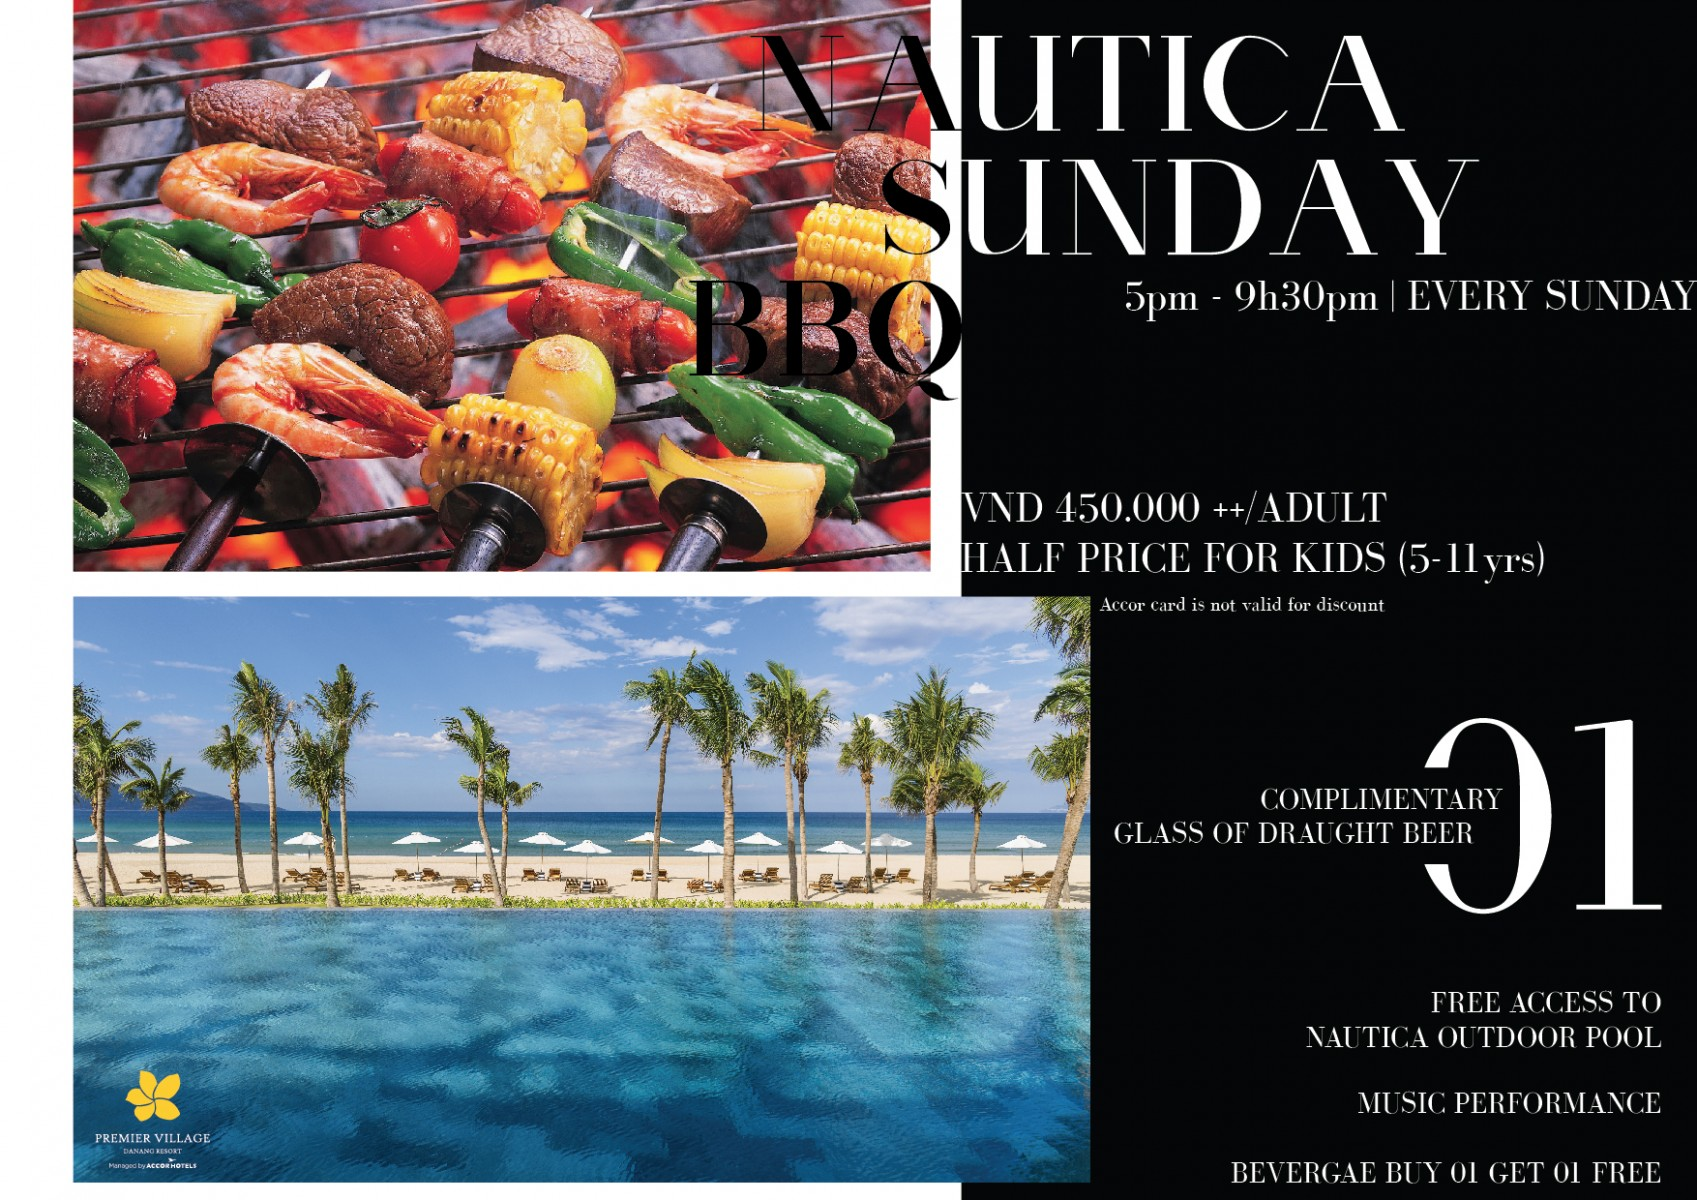 nautica-sunday-bbq-pool-party